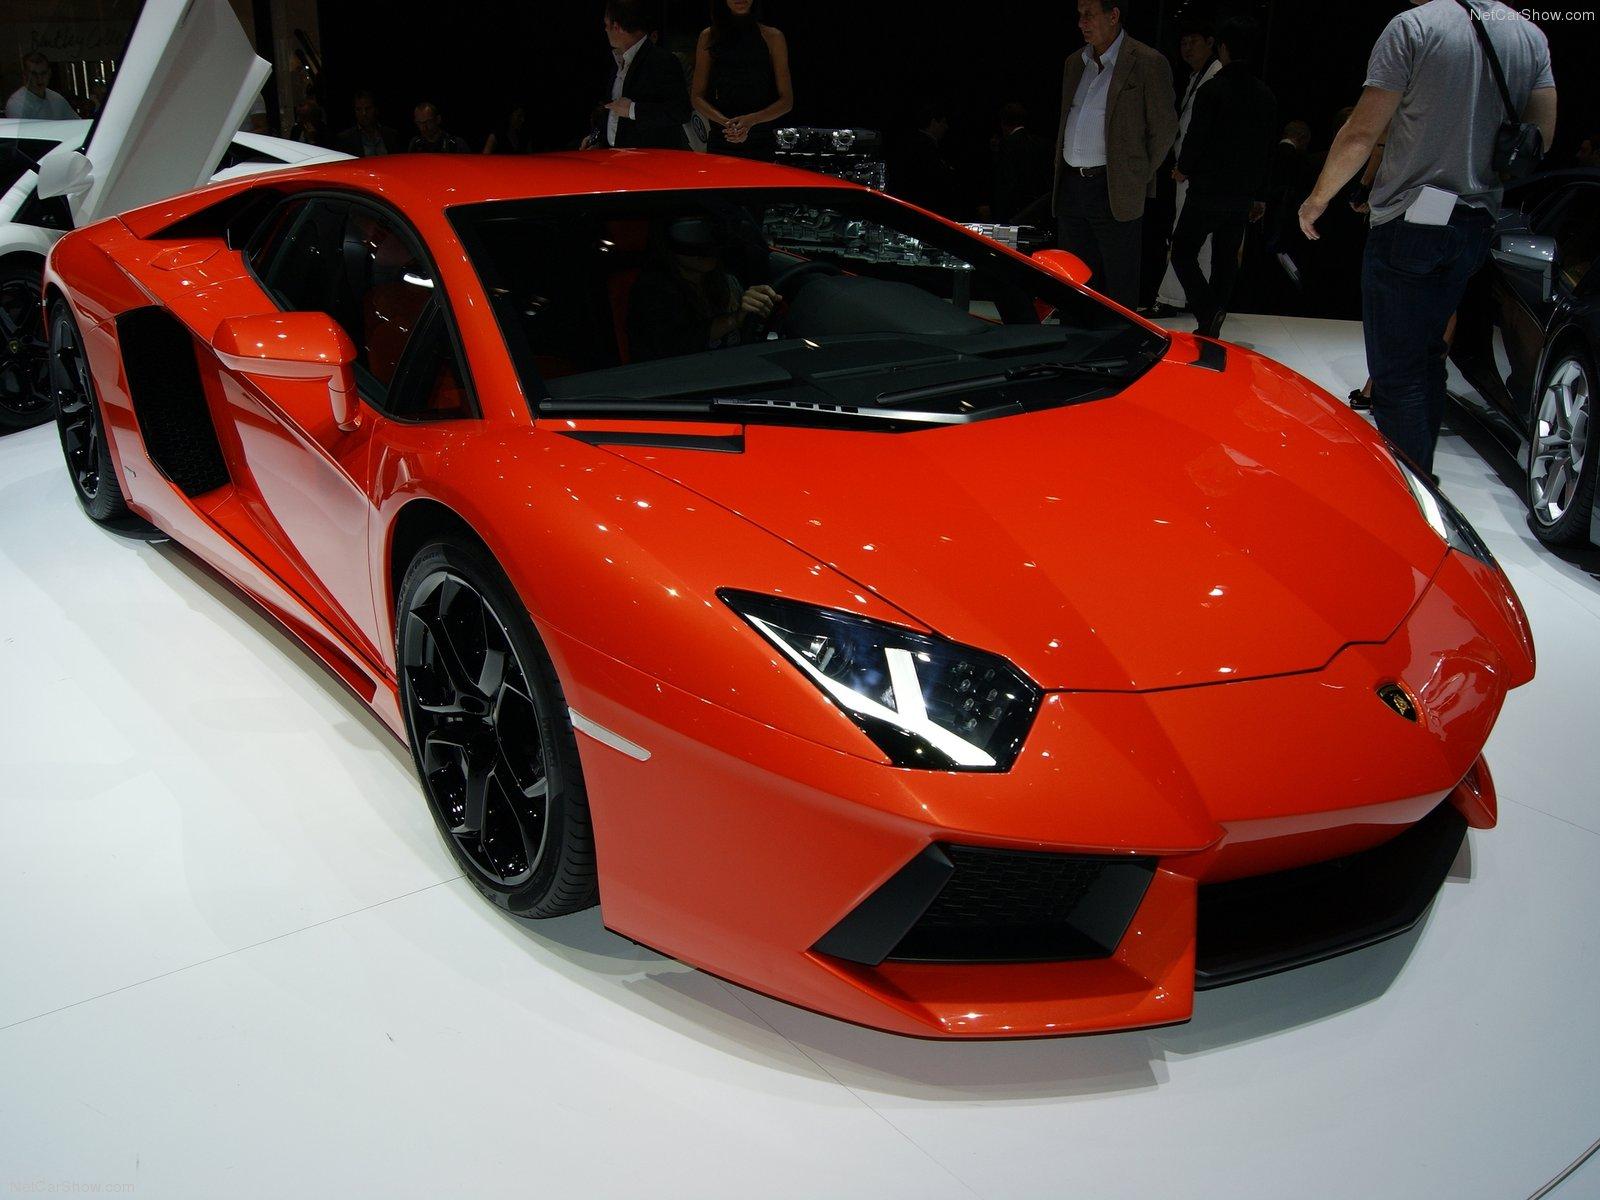 http://3.bp.blogspot.com/-vCmfsPC7VPk/T4lI6rpH6gI/AAAAAAAAQNs/IND7UbmmngM/s1600/Lamborghini--wallpaper++00008.jpg